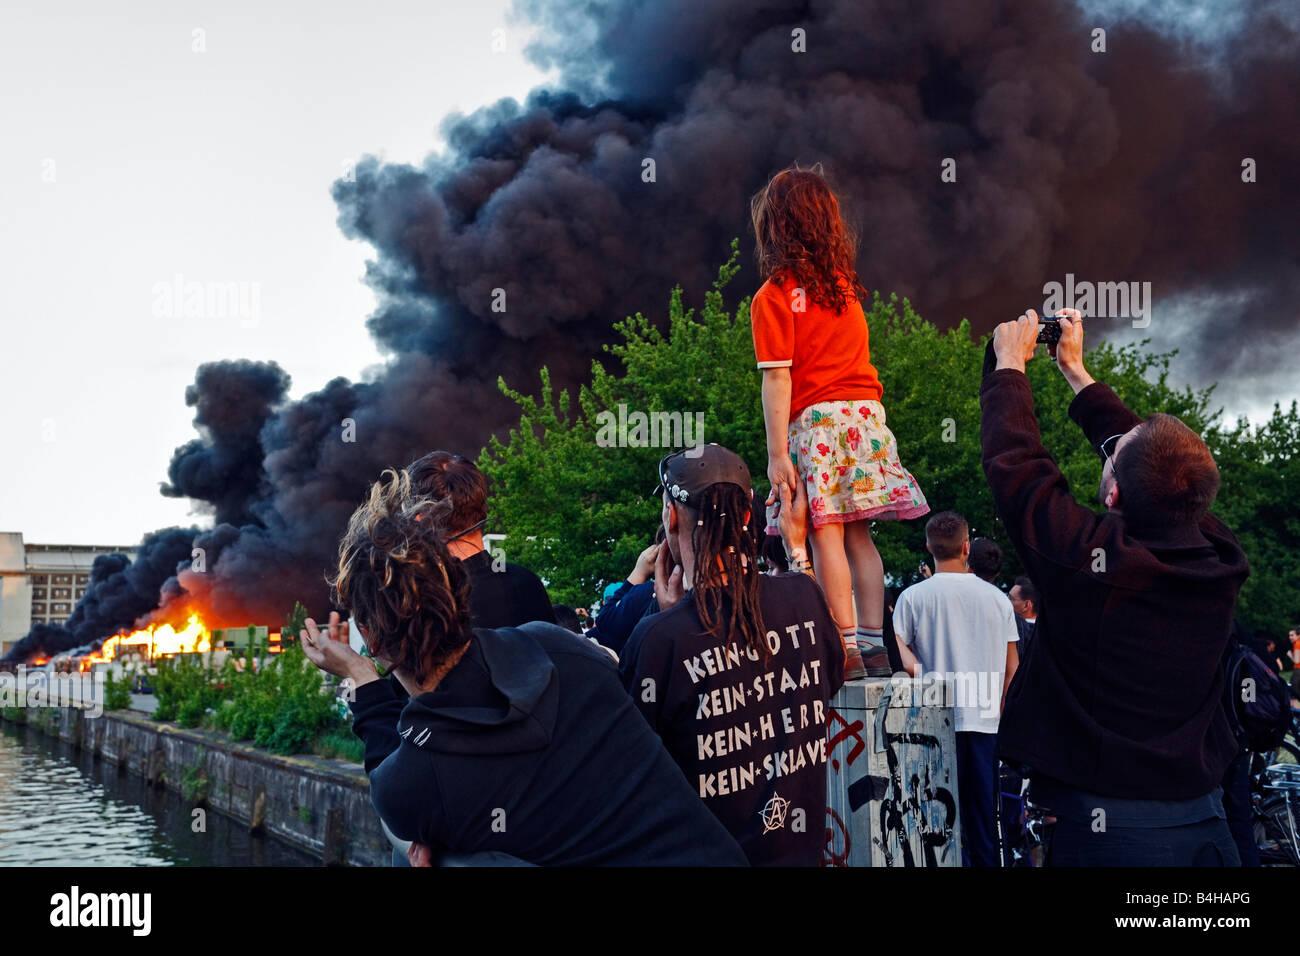 People looking at burning paper mill, Kreuzberg, Berlin, Germany - Stock Image